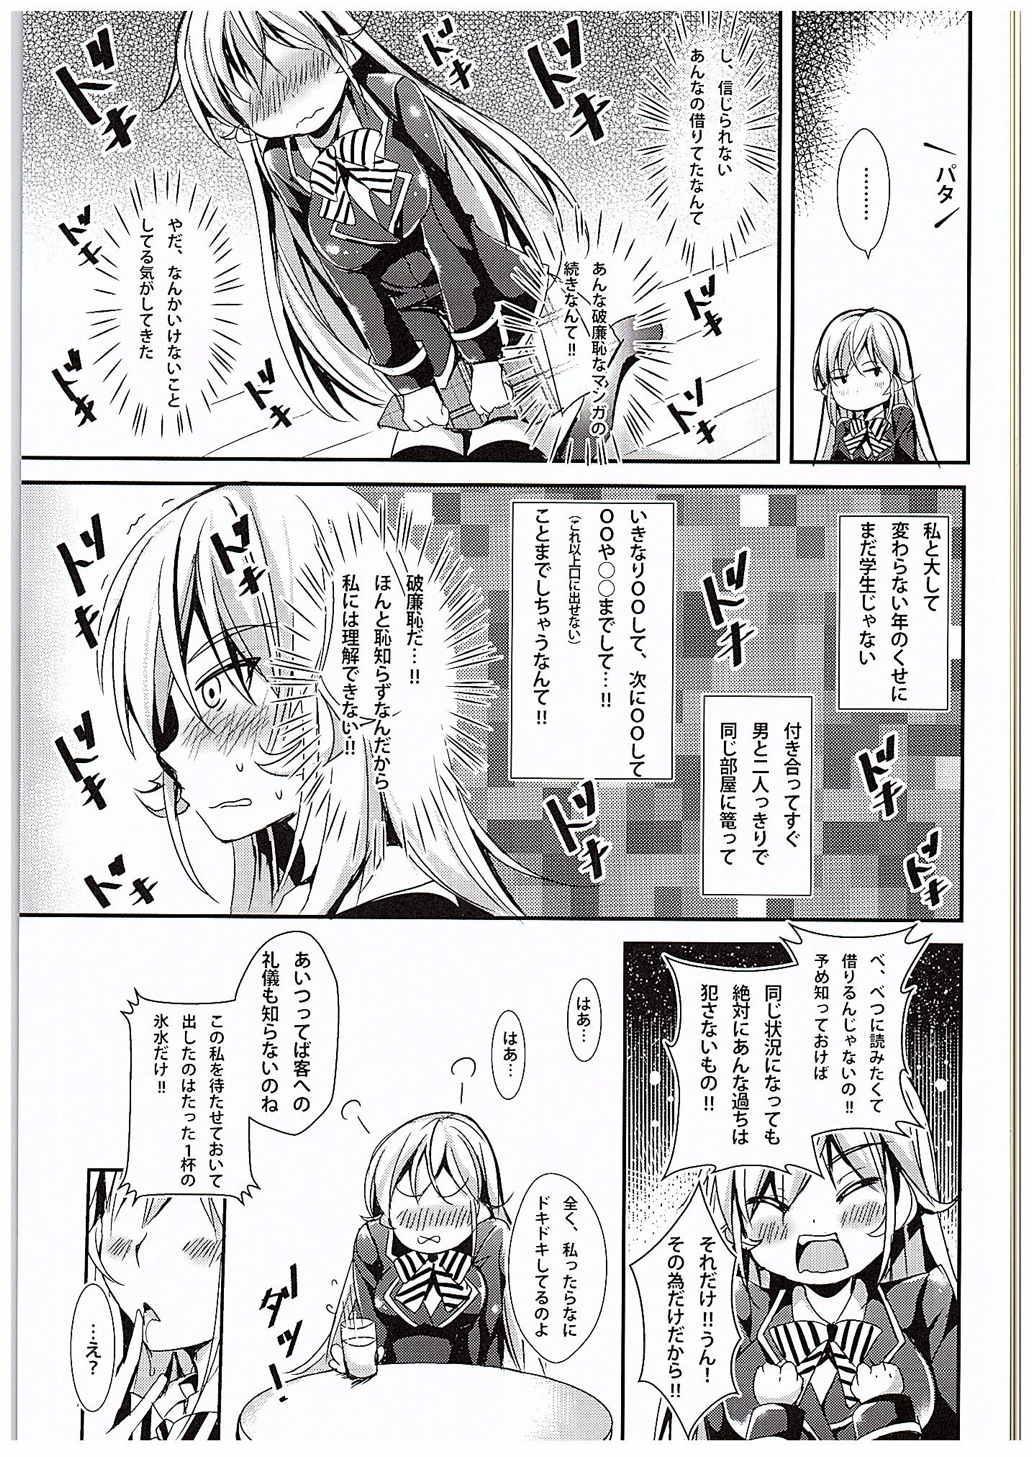 Erina to Shoujo Manga 3